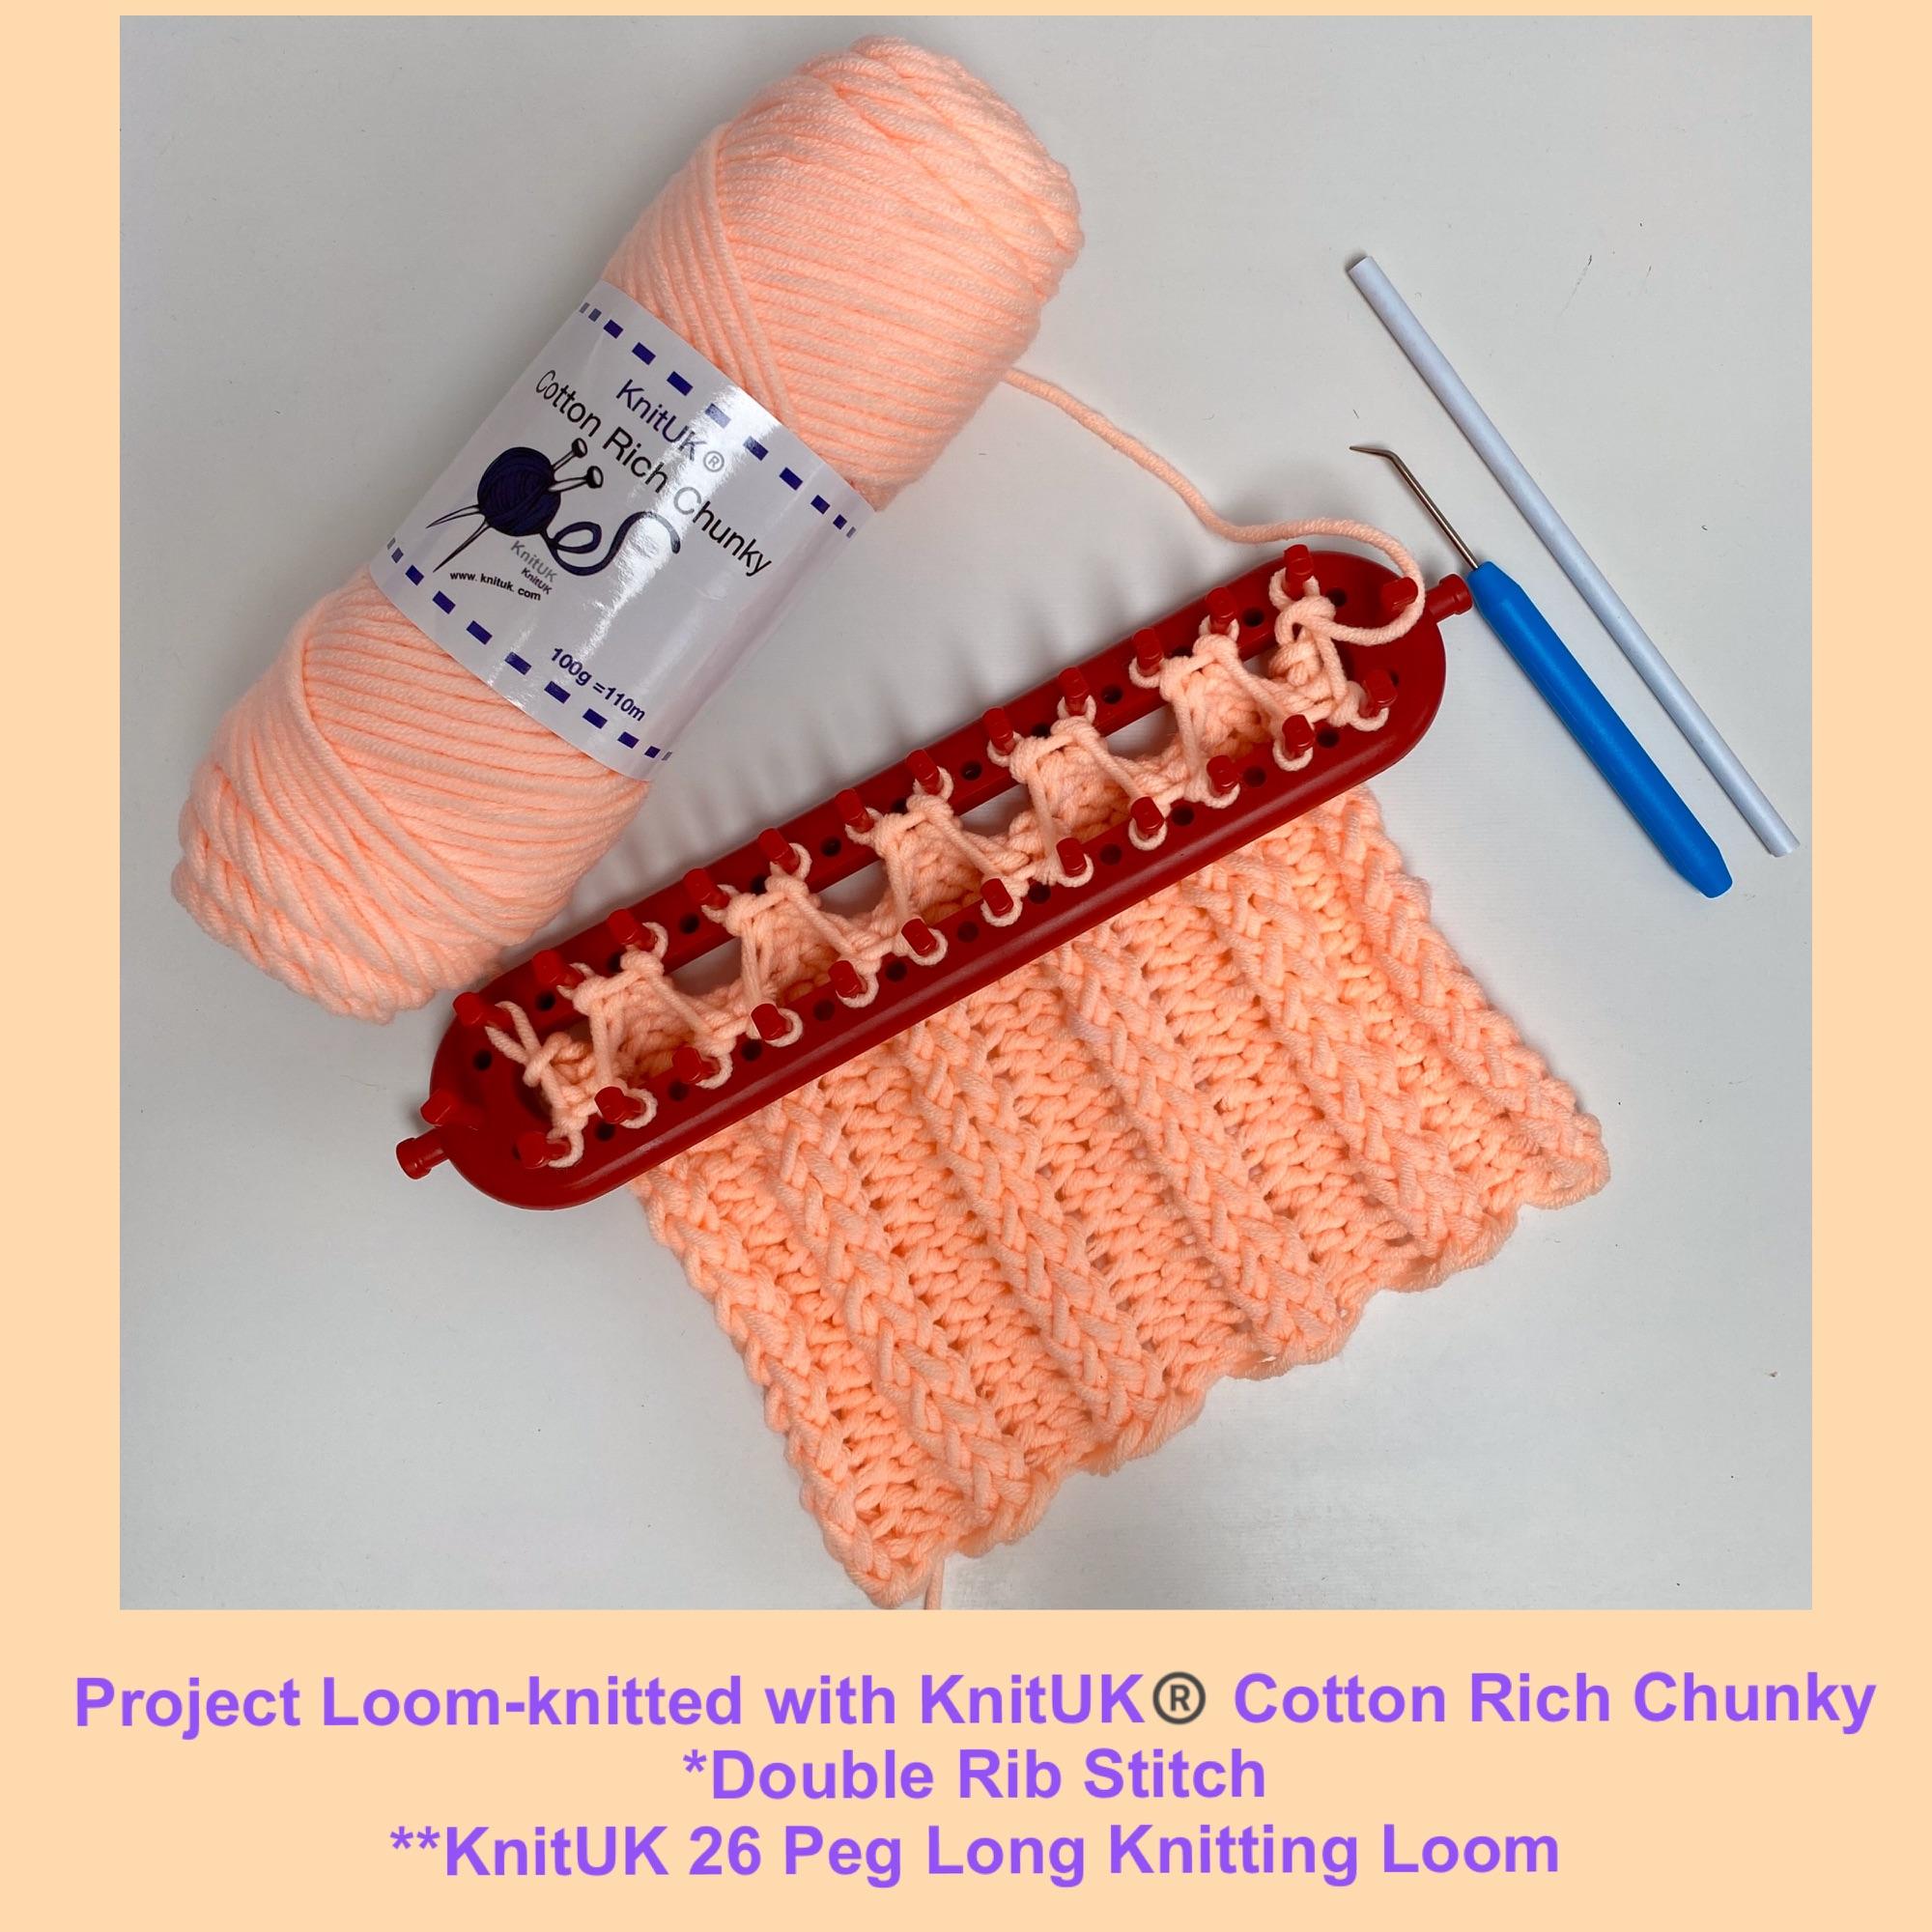 KnitUK cotton rich chunky yarn knitting loom scarf double rib